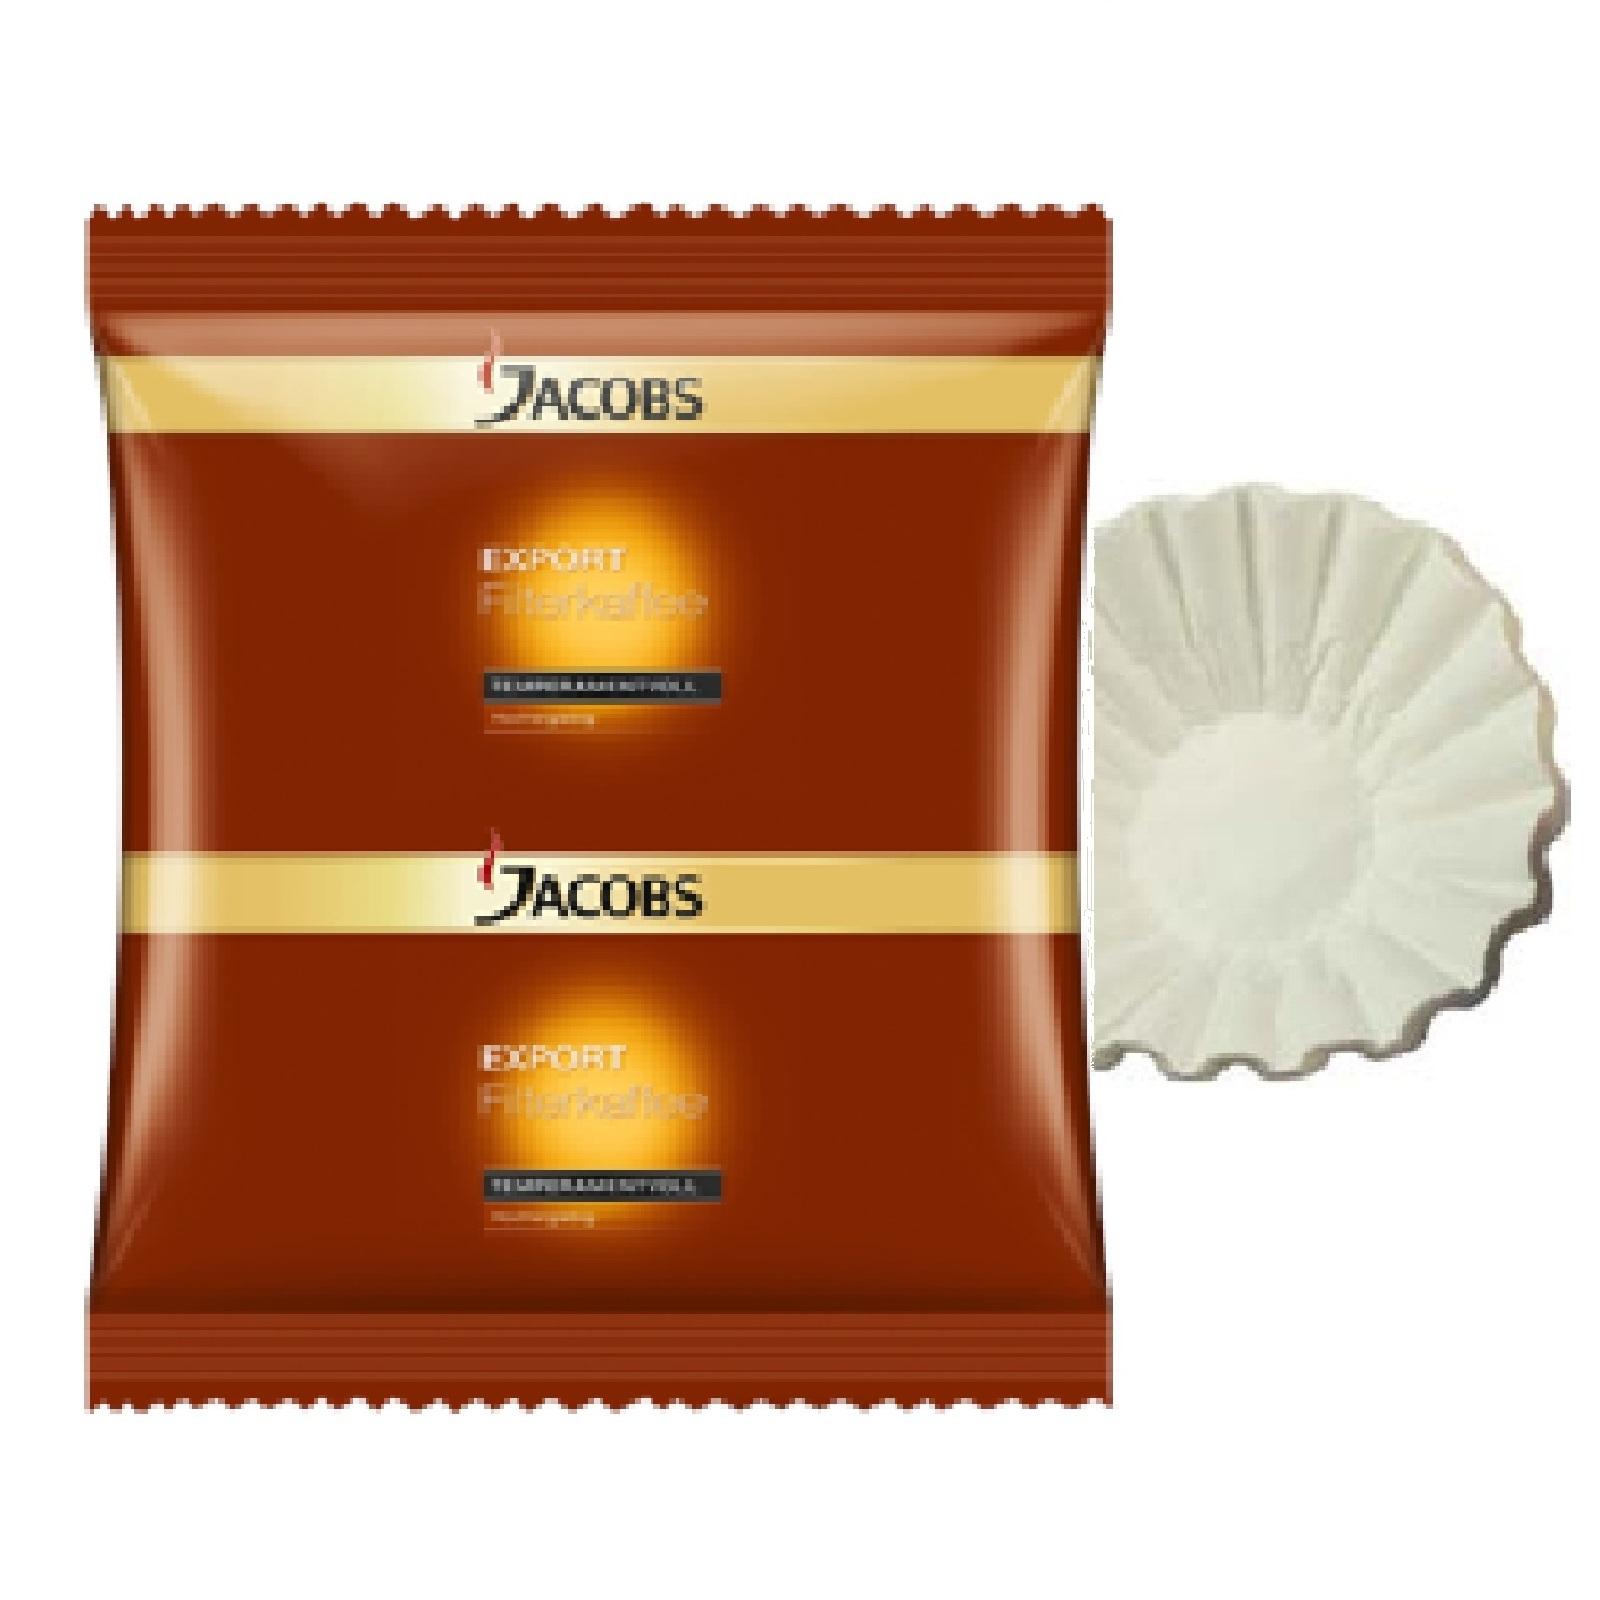 Jacobs Export Temperamentvoll HY 45 x 55g Röstkaffee inkl. 50 Korbfilter